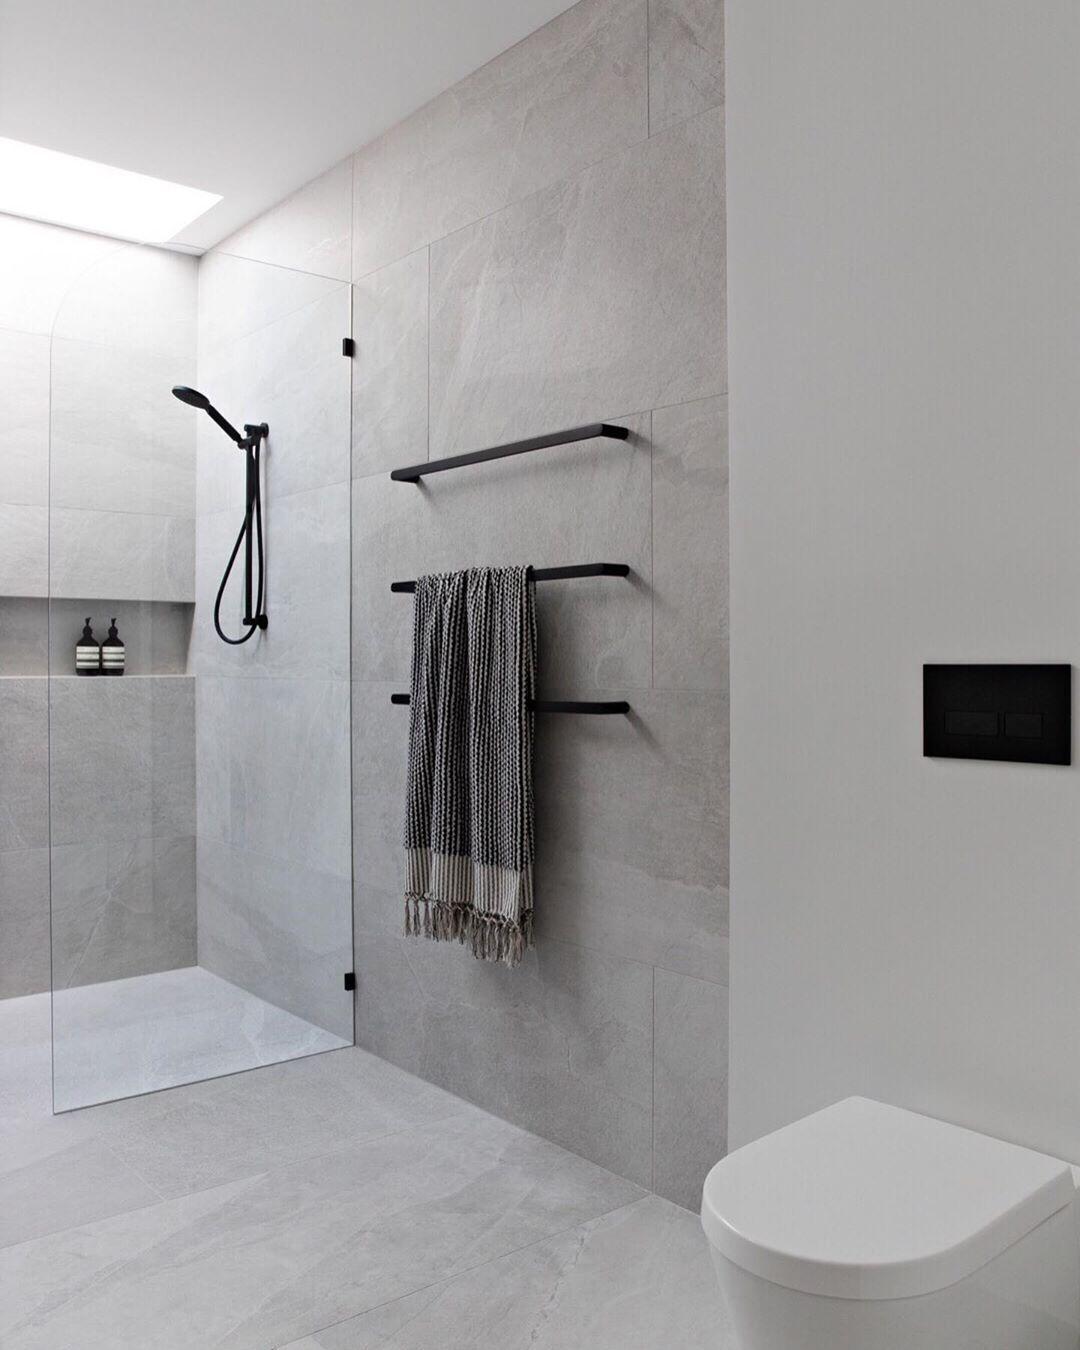 Design Styling Reno Tips On Instagram Z S Tip A Designer Look For Less Looking To Add That D Badezimmer Badrenovierung Badezimmer Klein